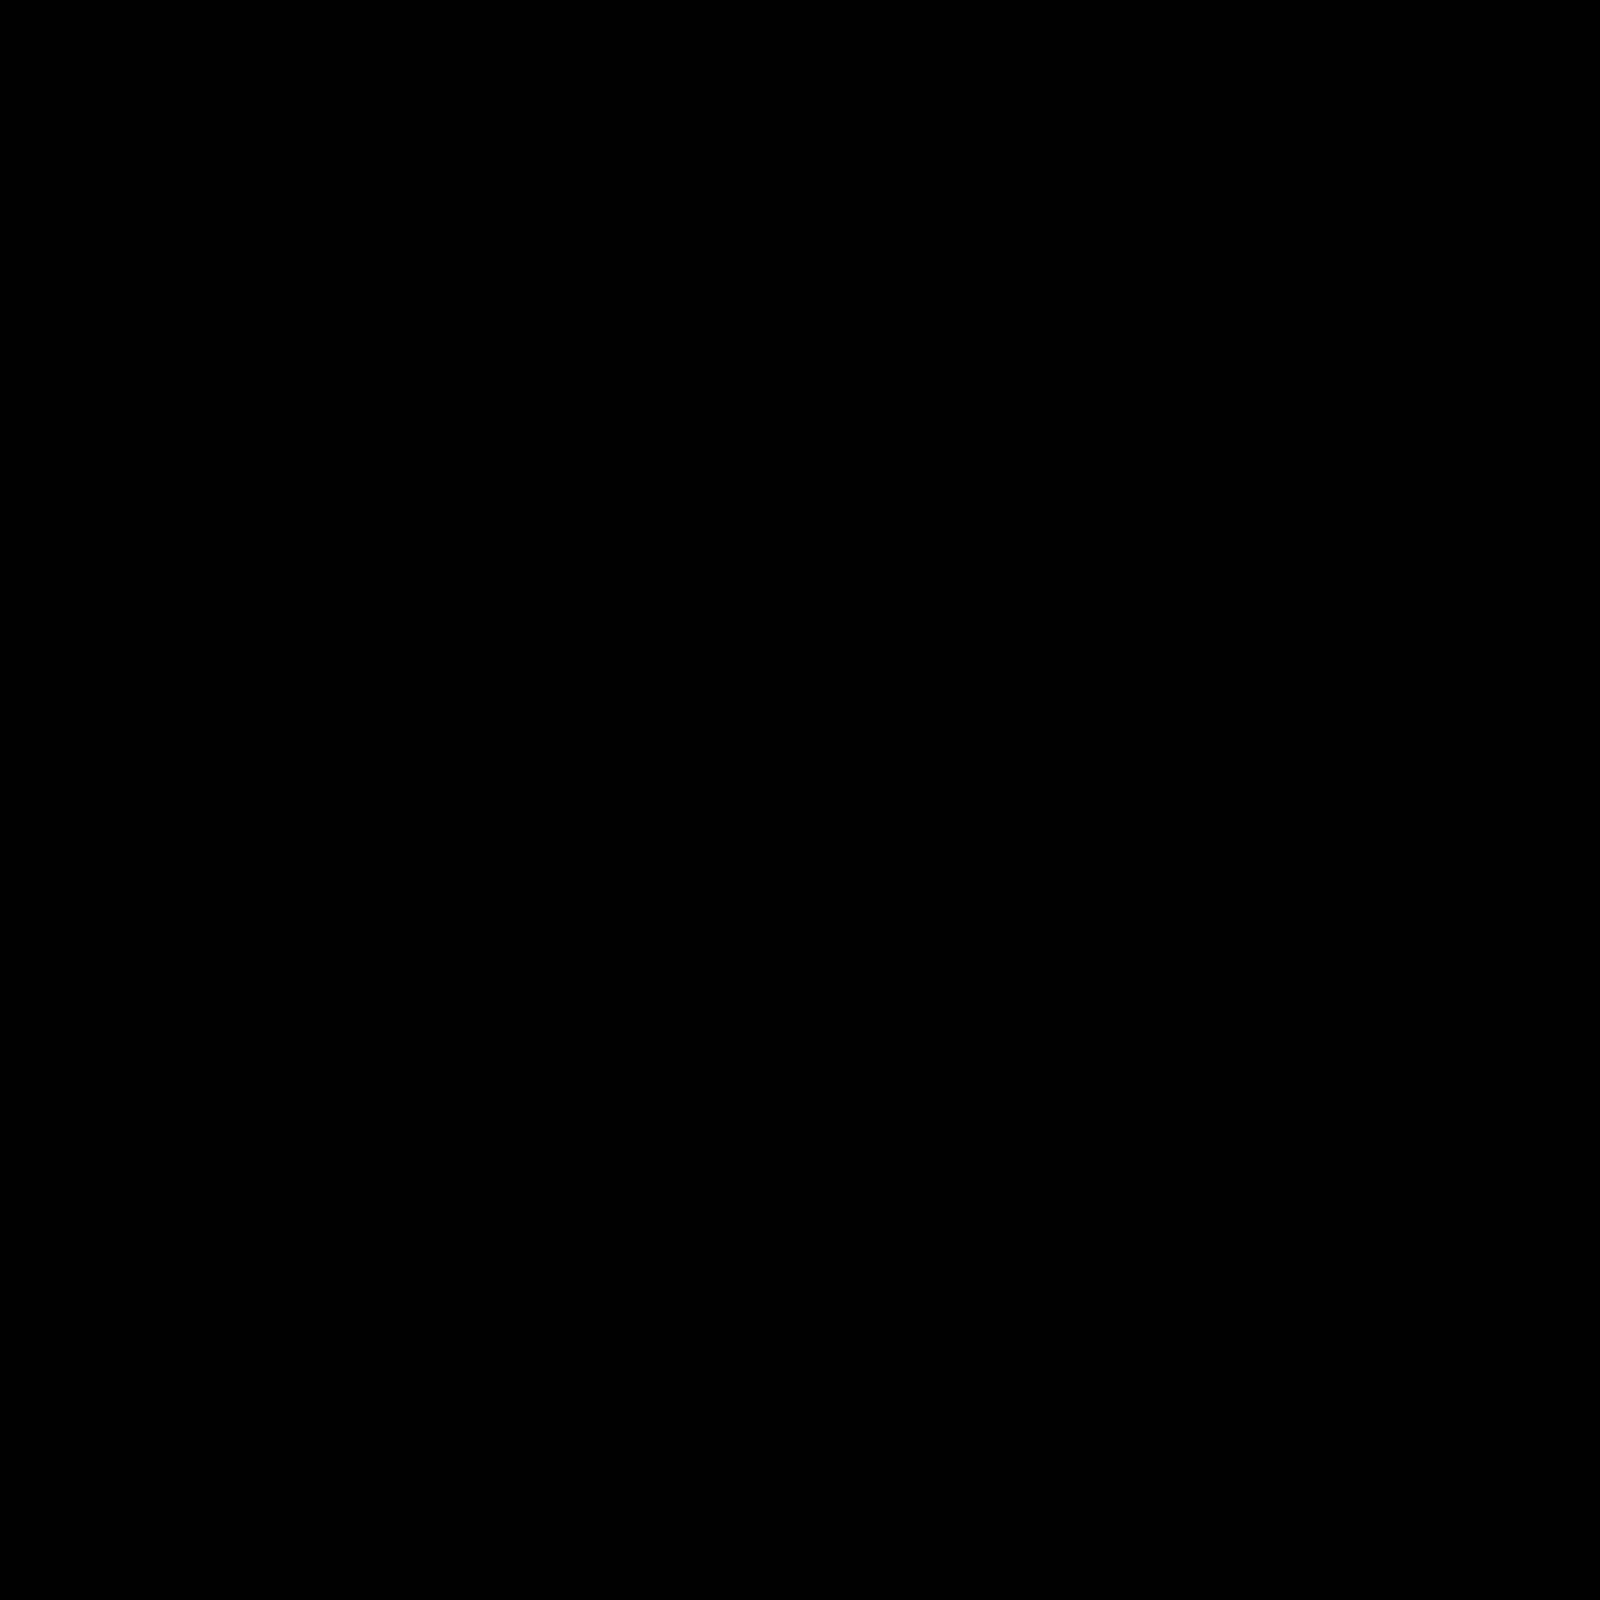 Kask Doktora Fate icon